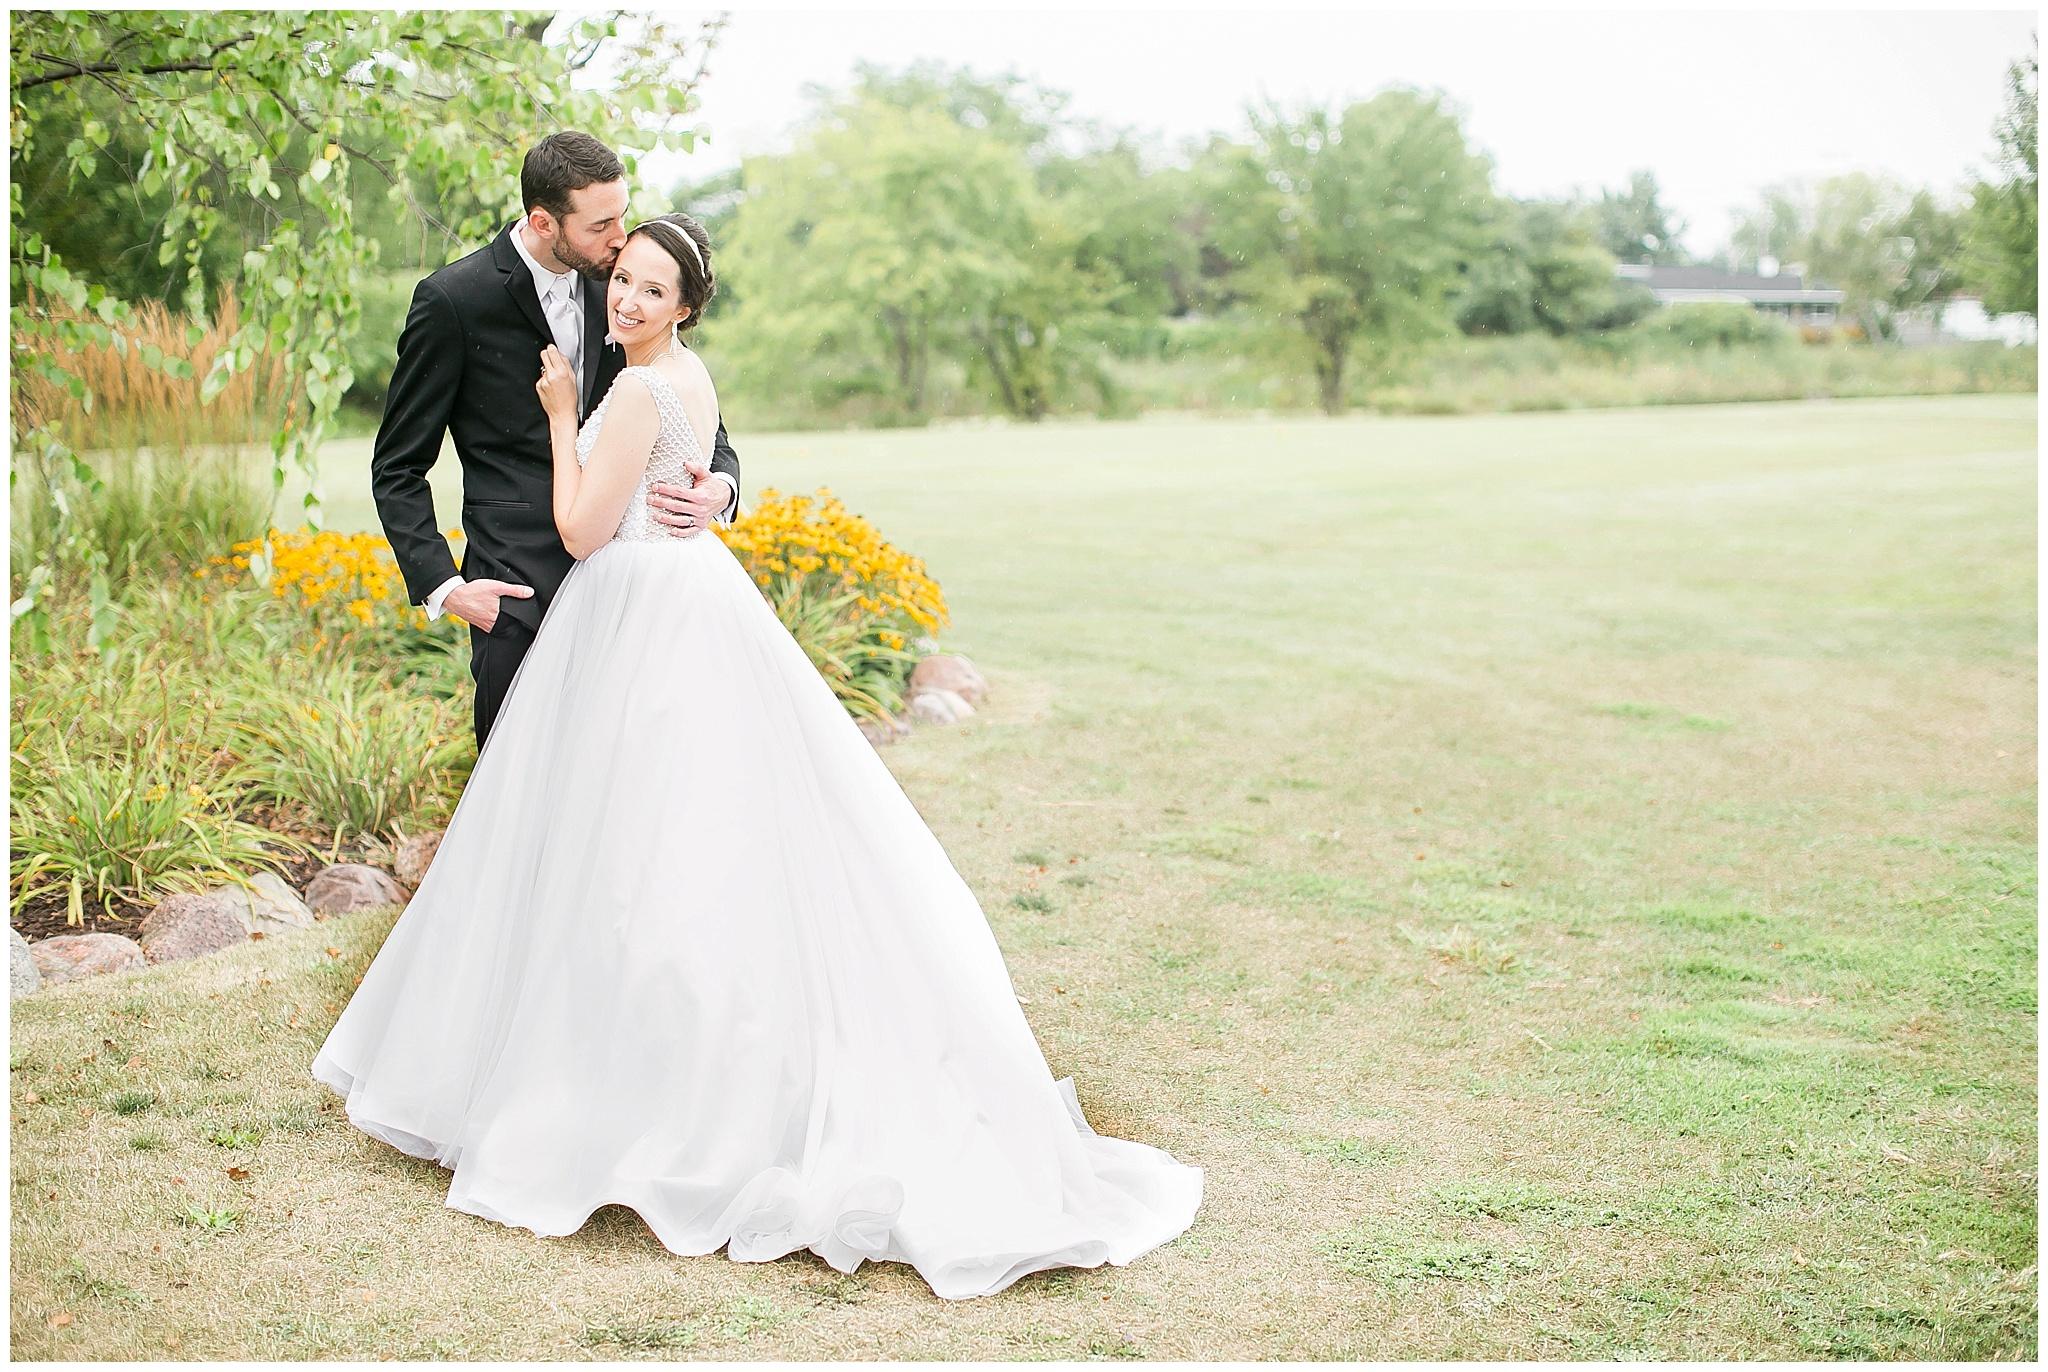 bridgewood_resort_wedding_neenah_wisconsin_0341.jpg